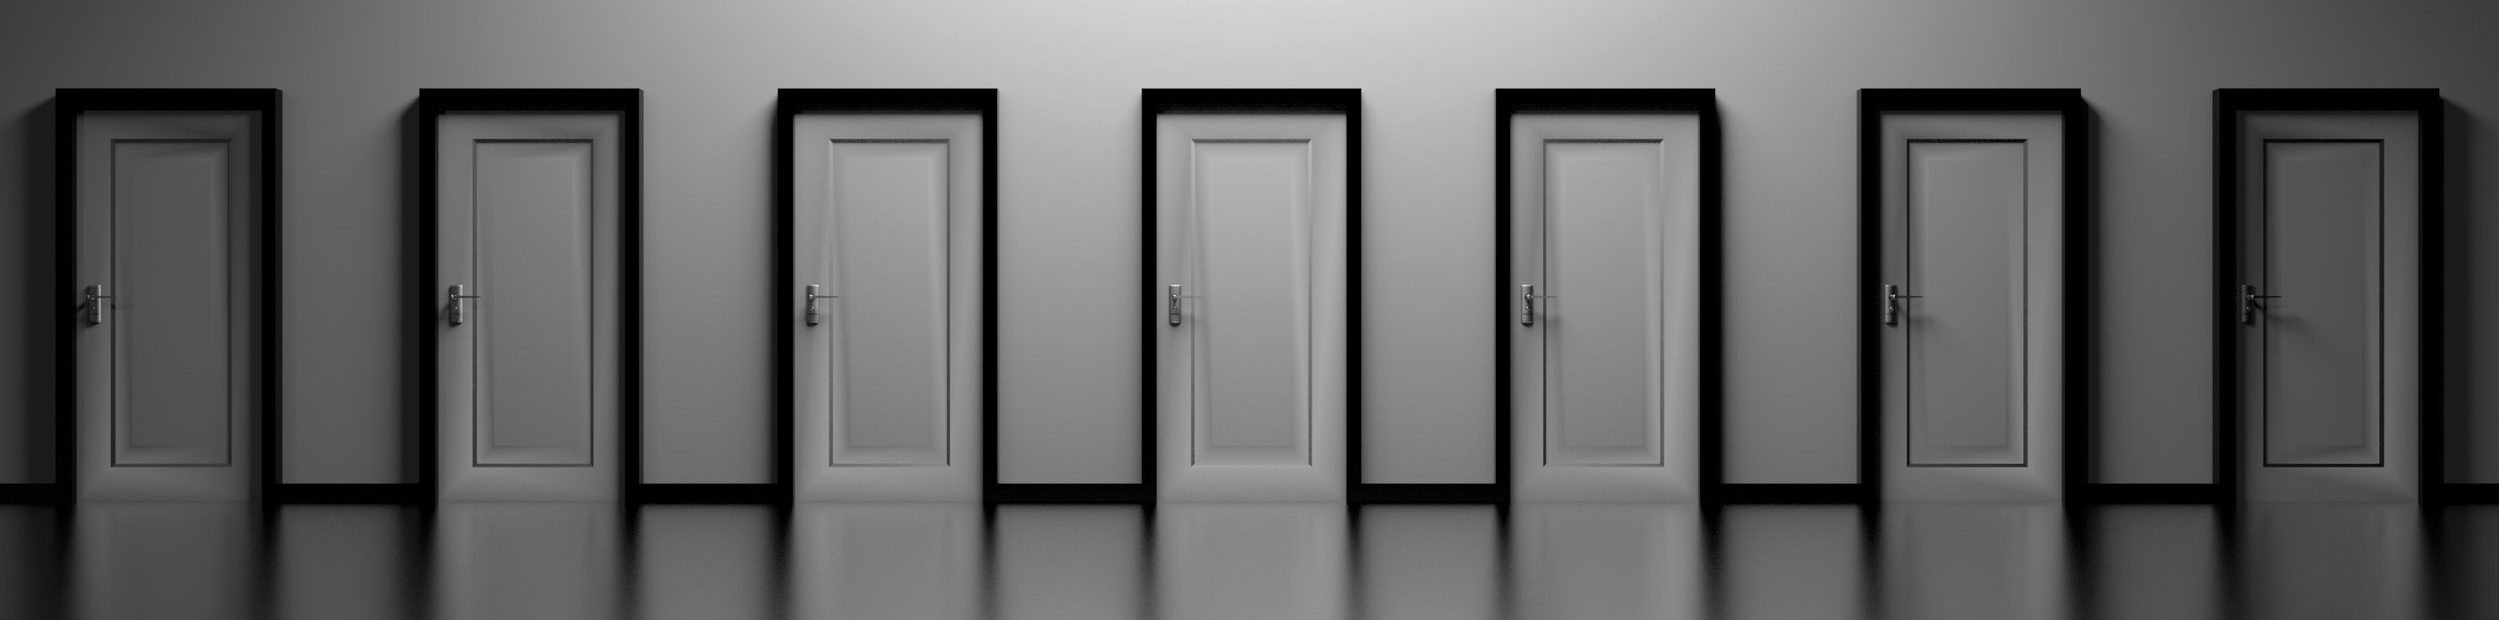 black-and-white-decision-doors-277017.jpg